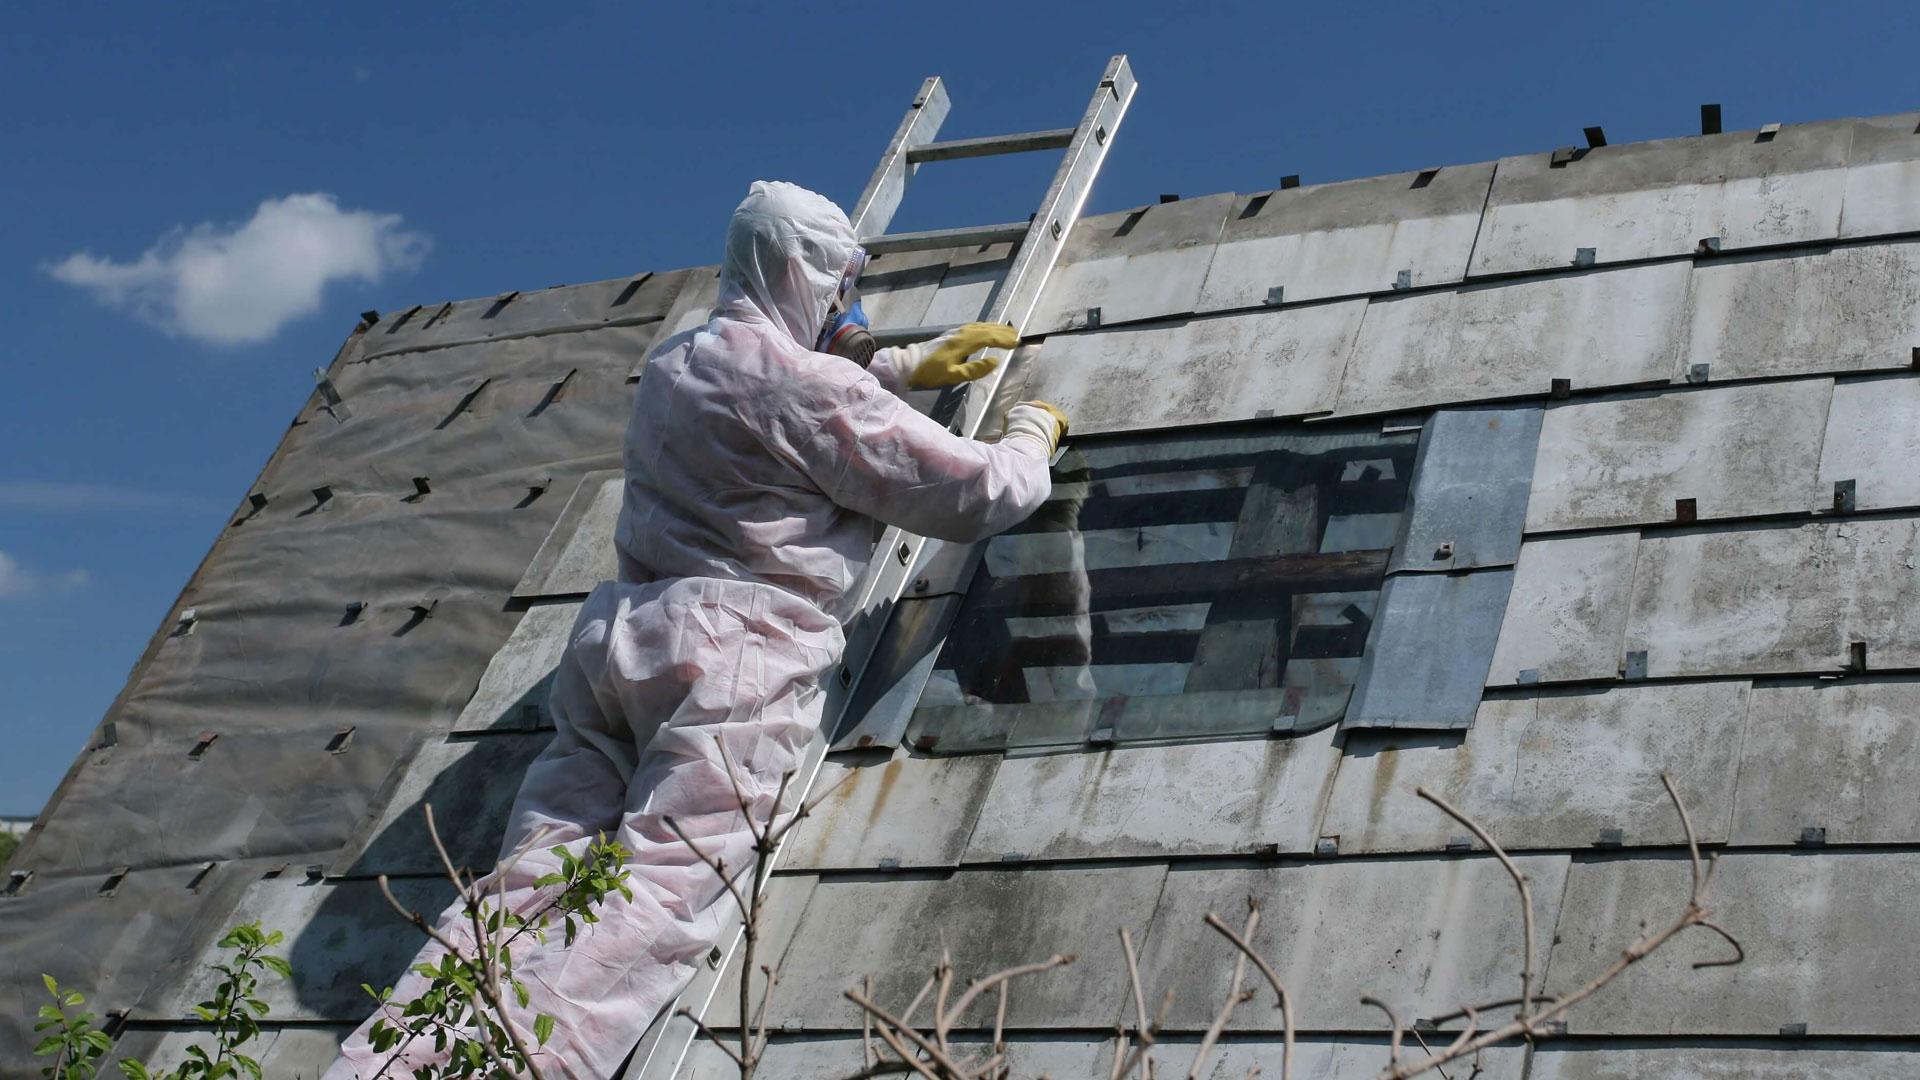 asbestos removal Kingsford, asbestos testing Sydney